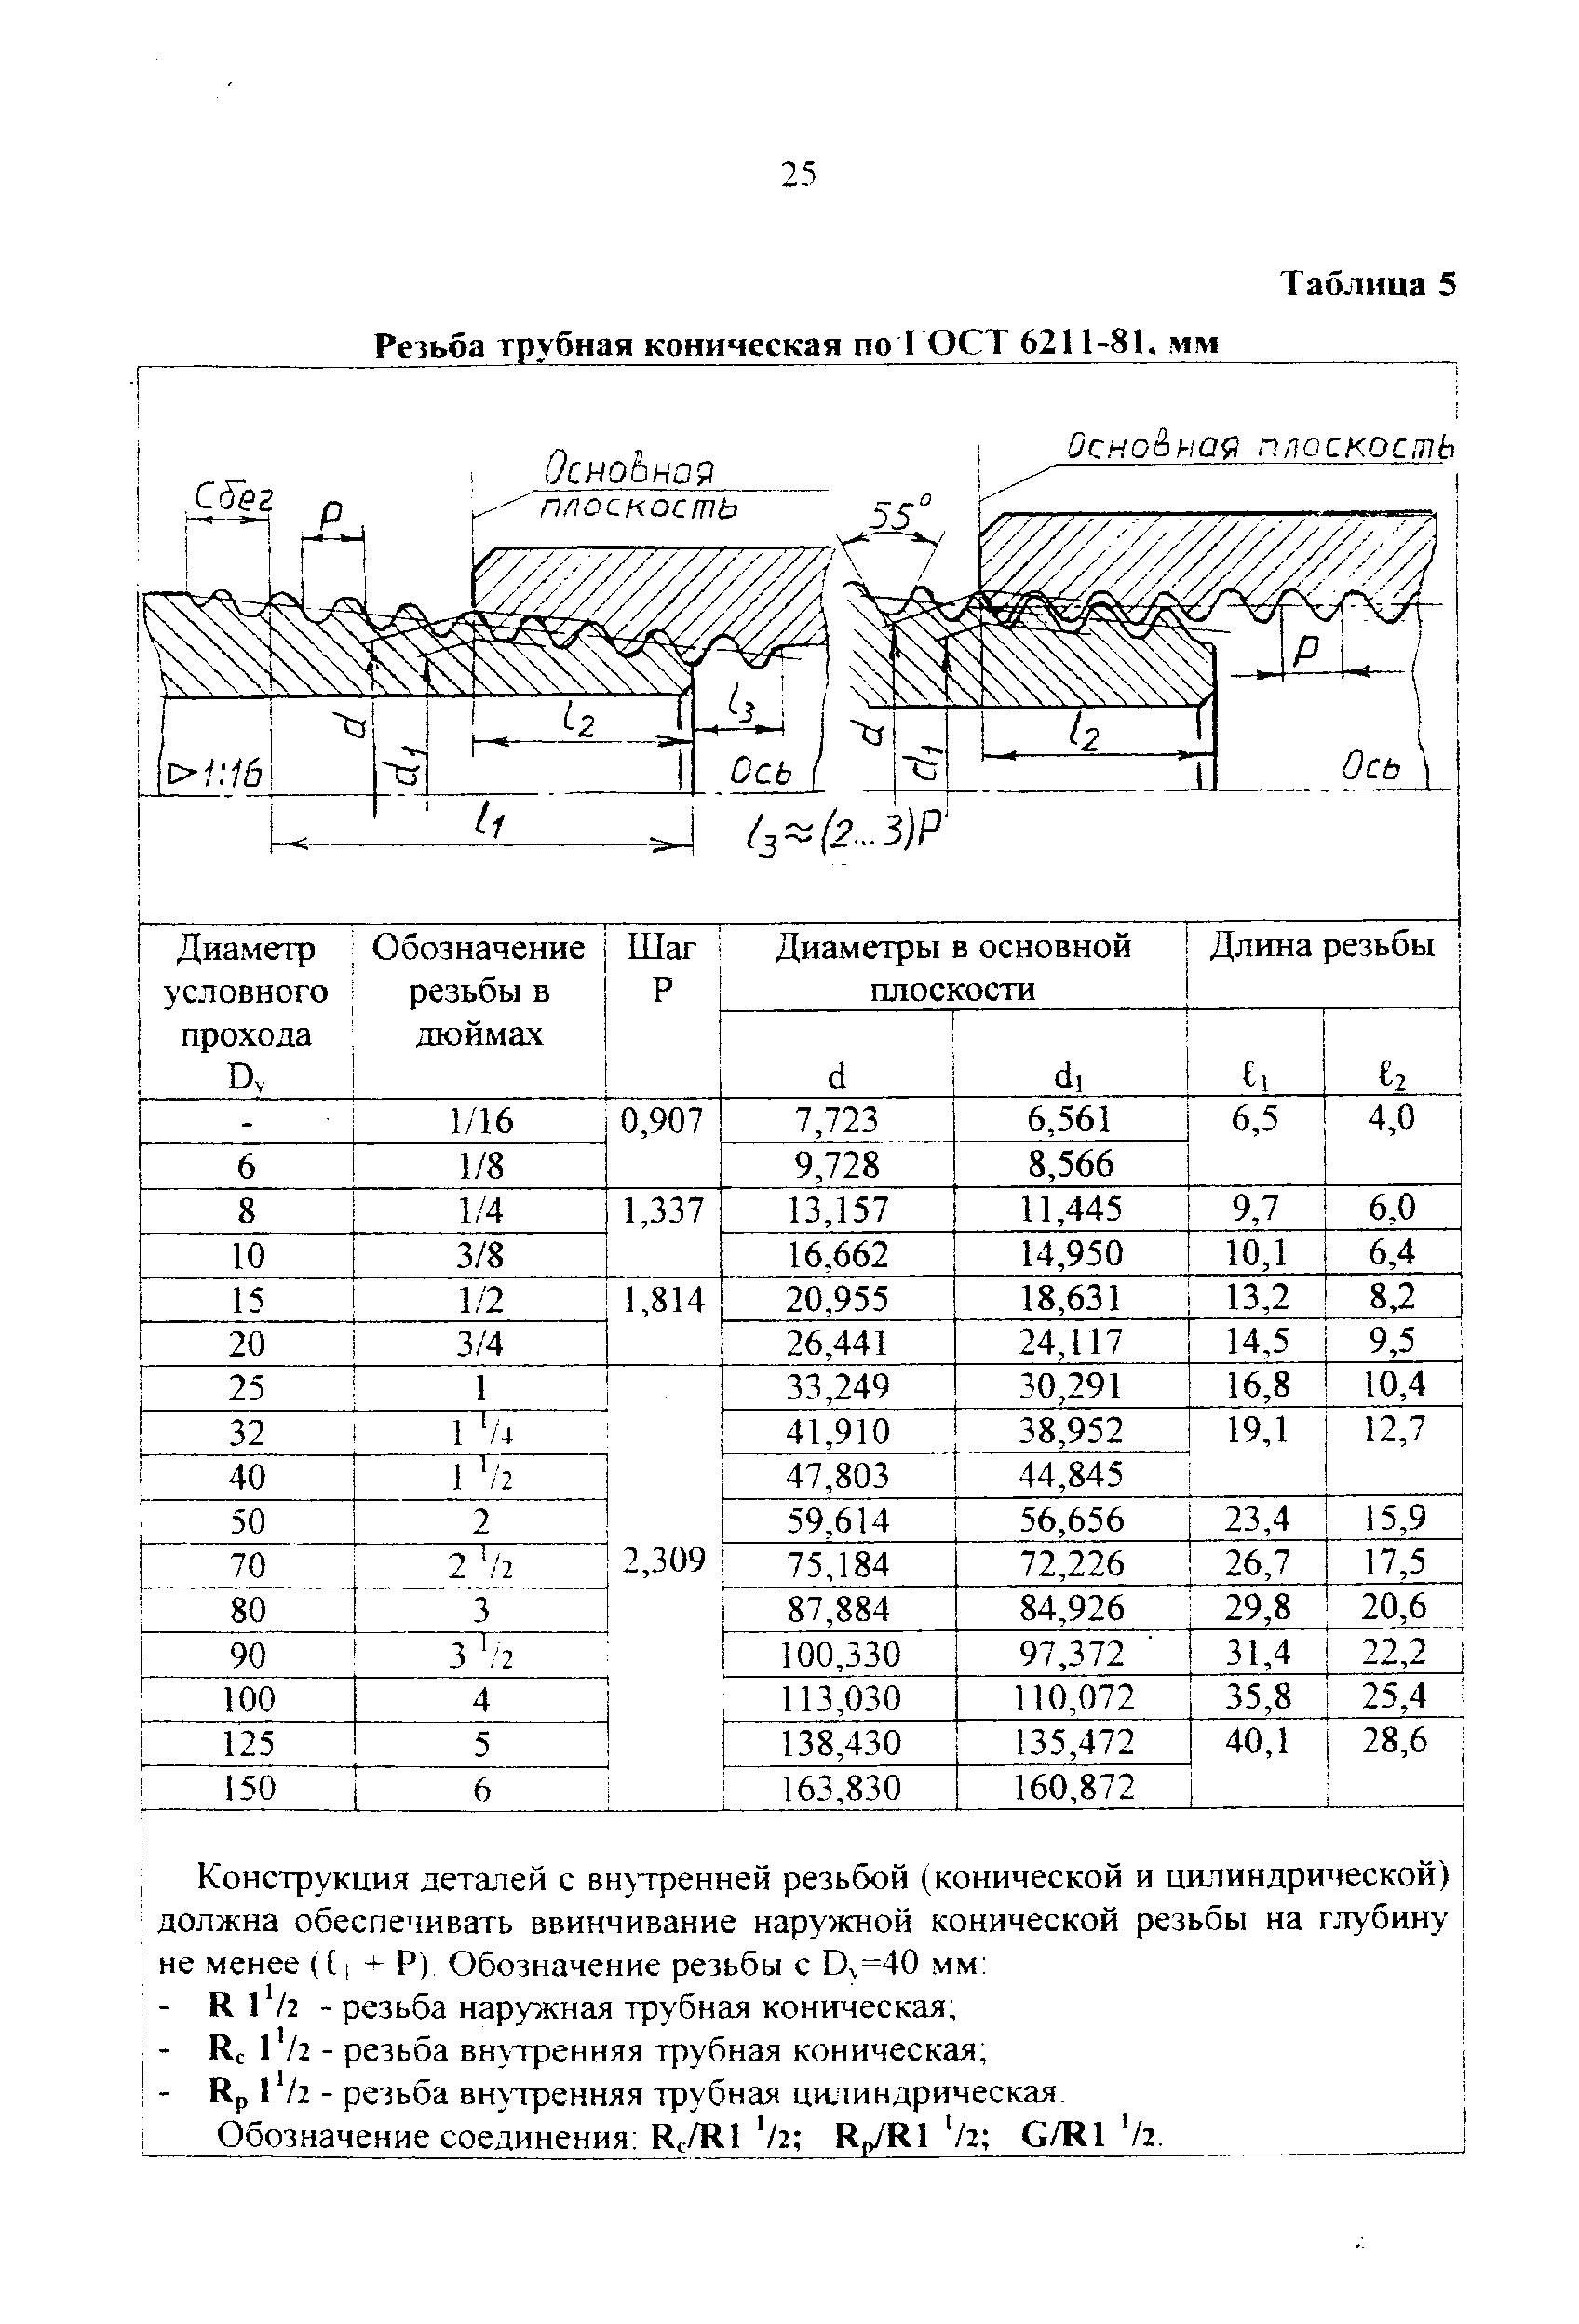 Основные параметры резьбы